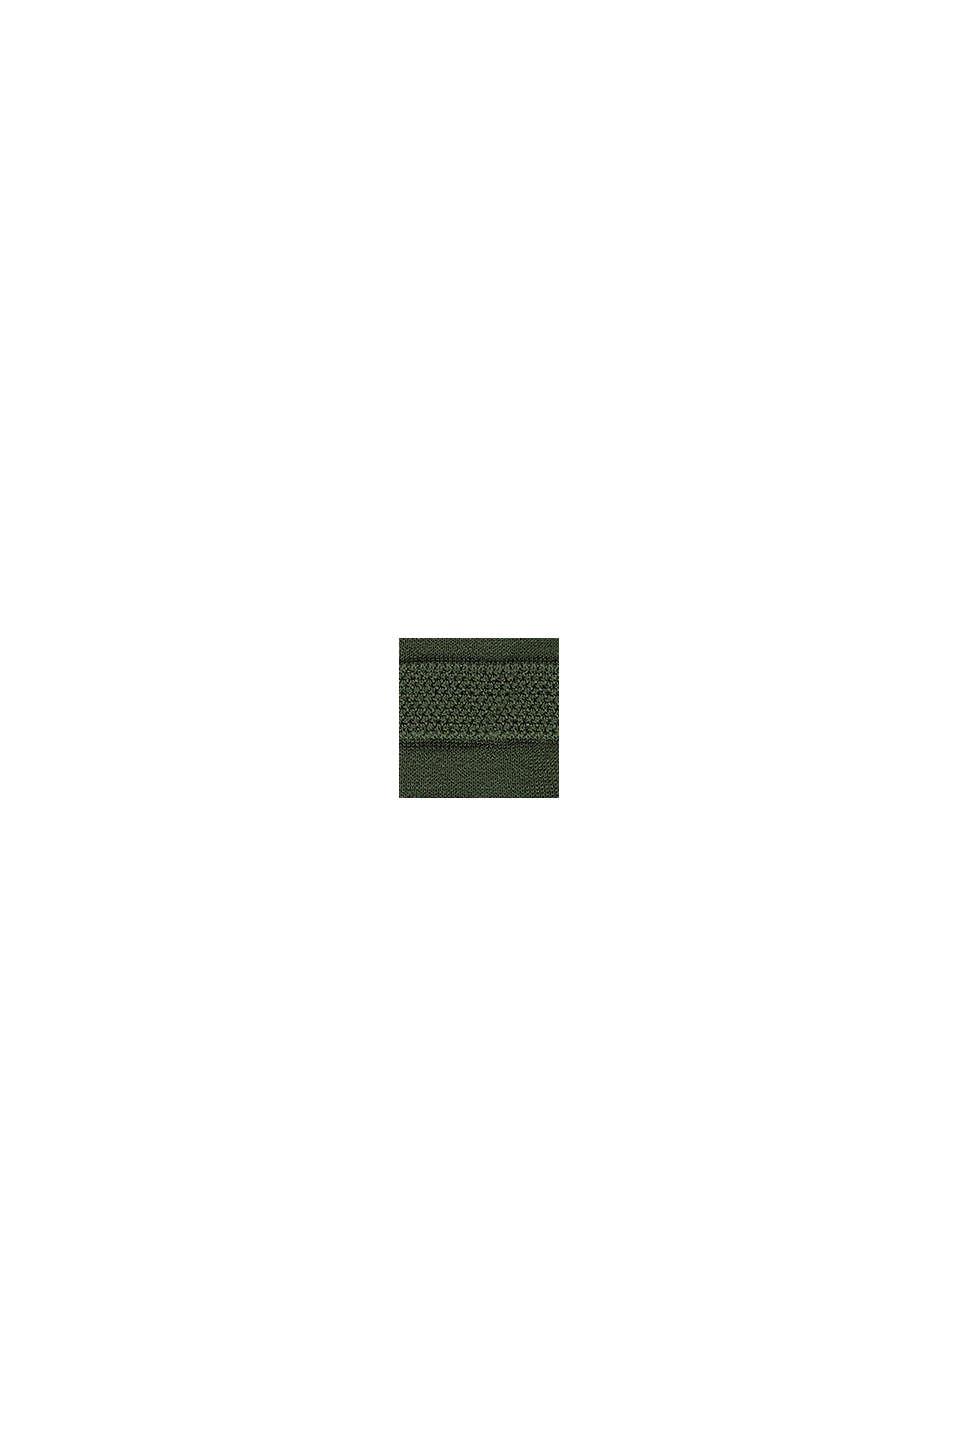 Zipp-Cardigan mit Streifen-Struktur, DARK KHAKI, swatch